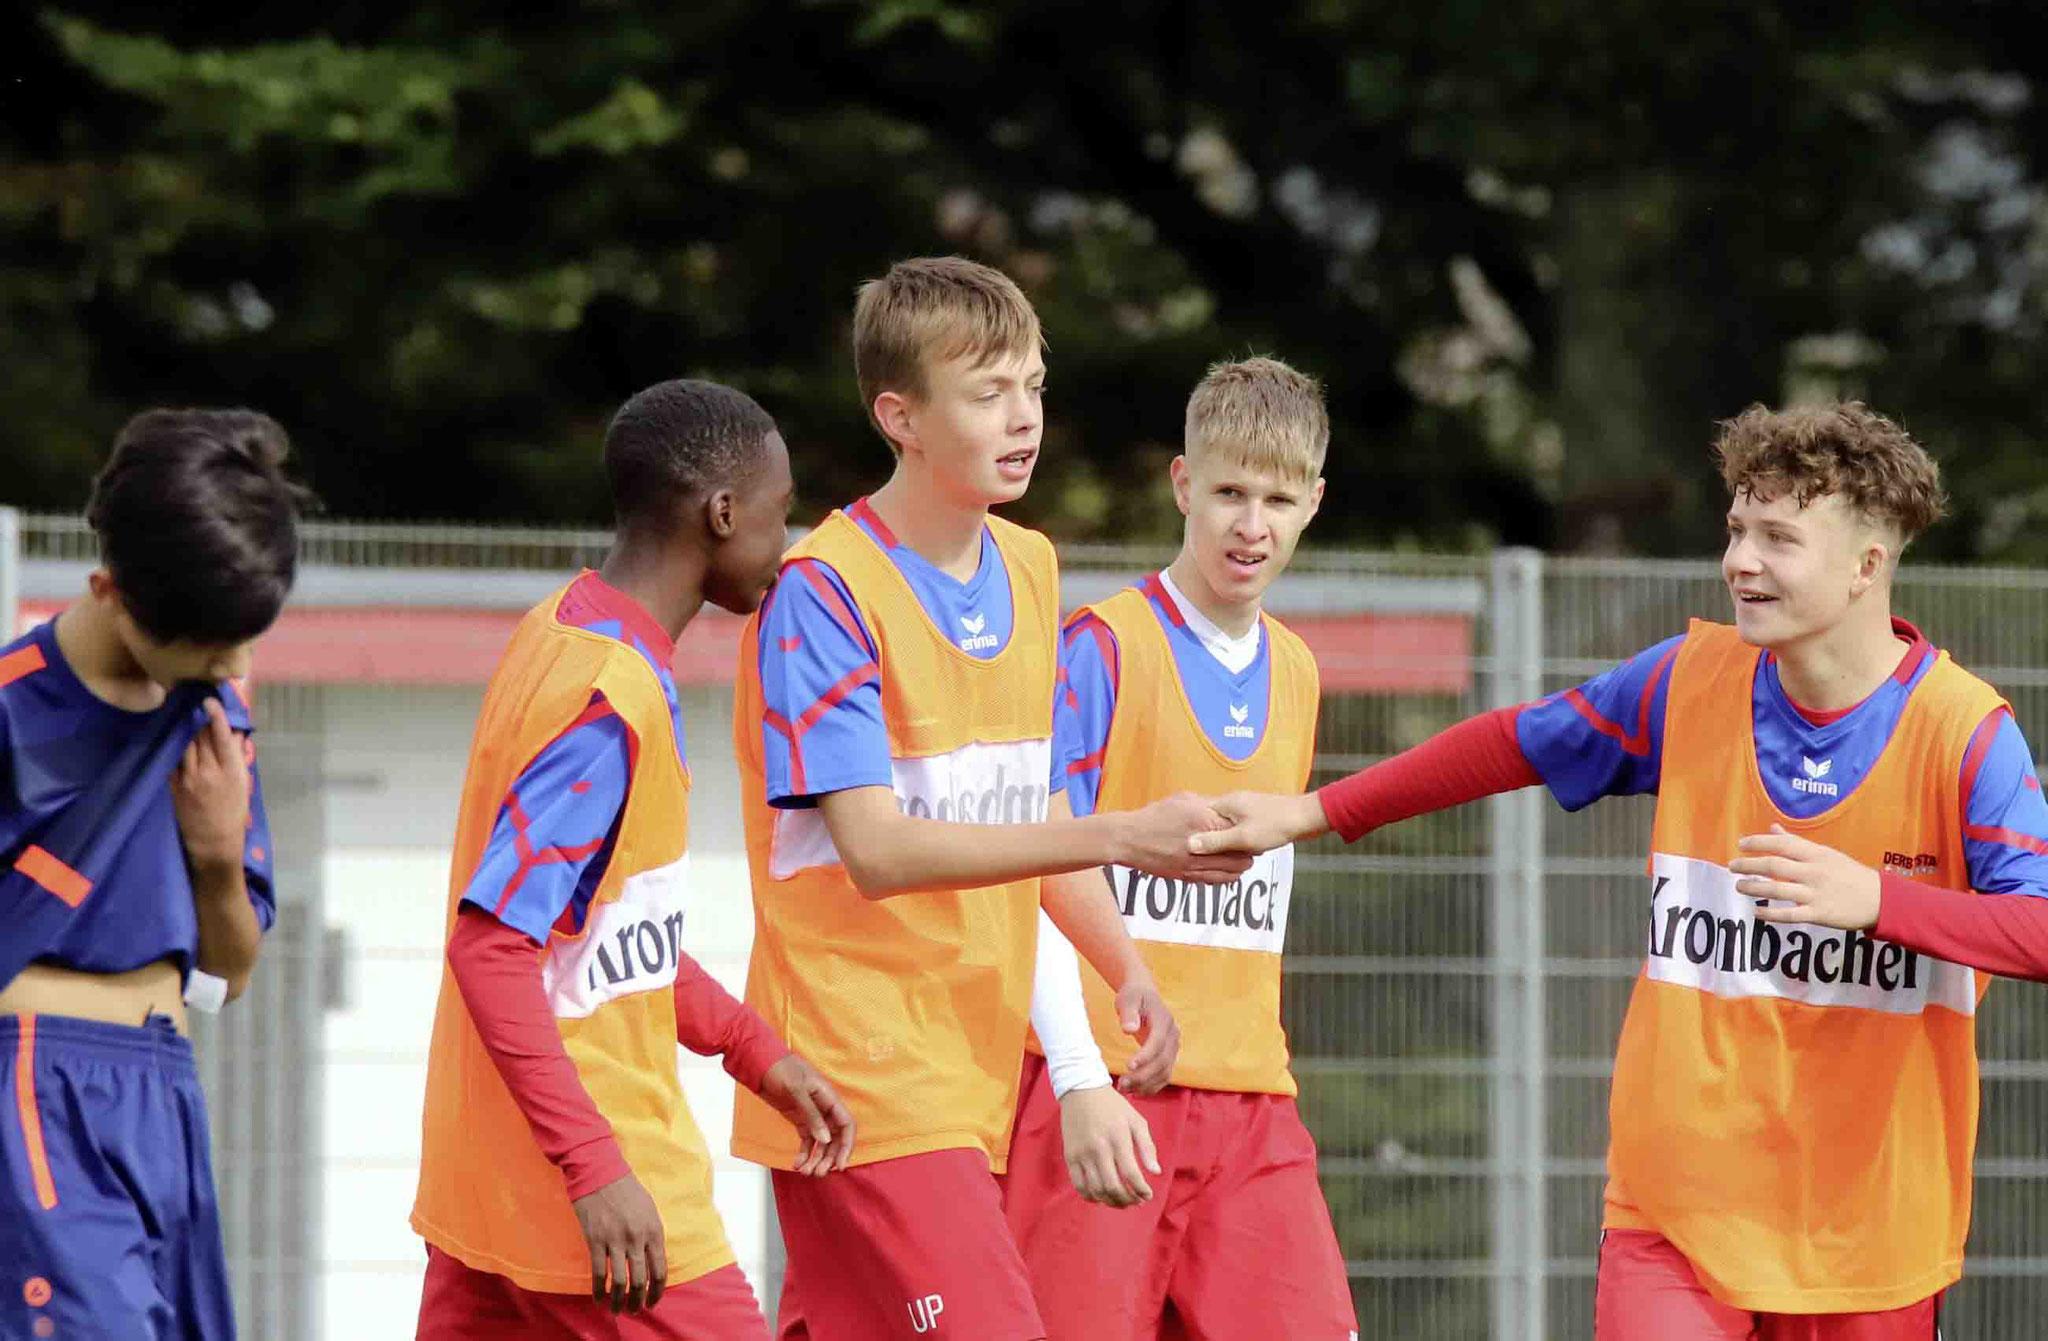 Rot Weiss Ahlen U16 gegen Ahlener SG